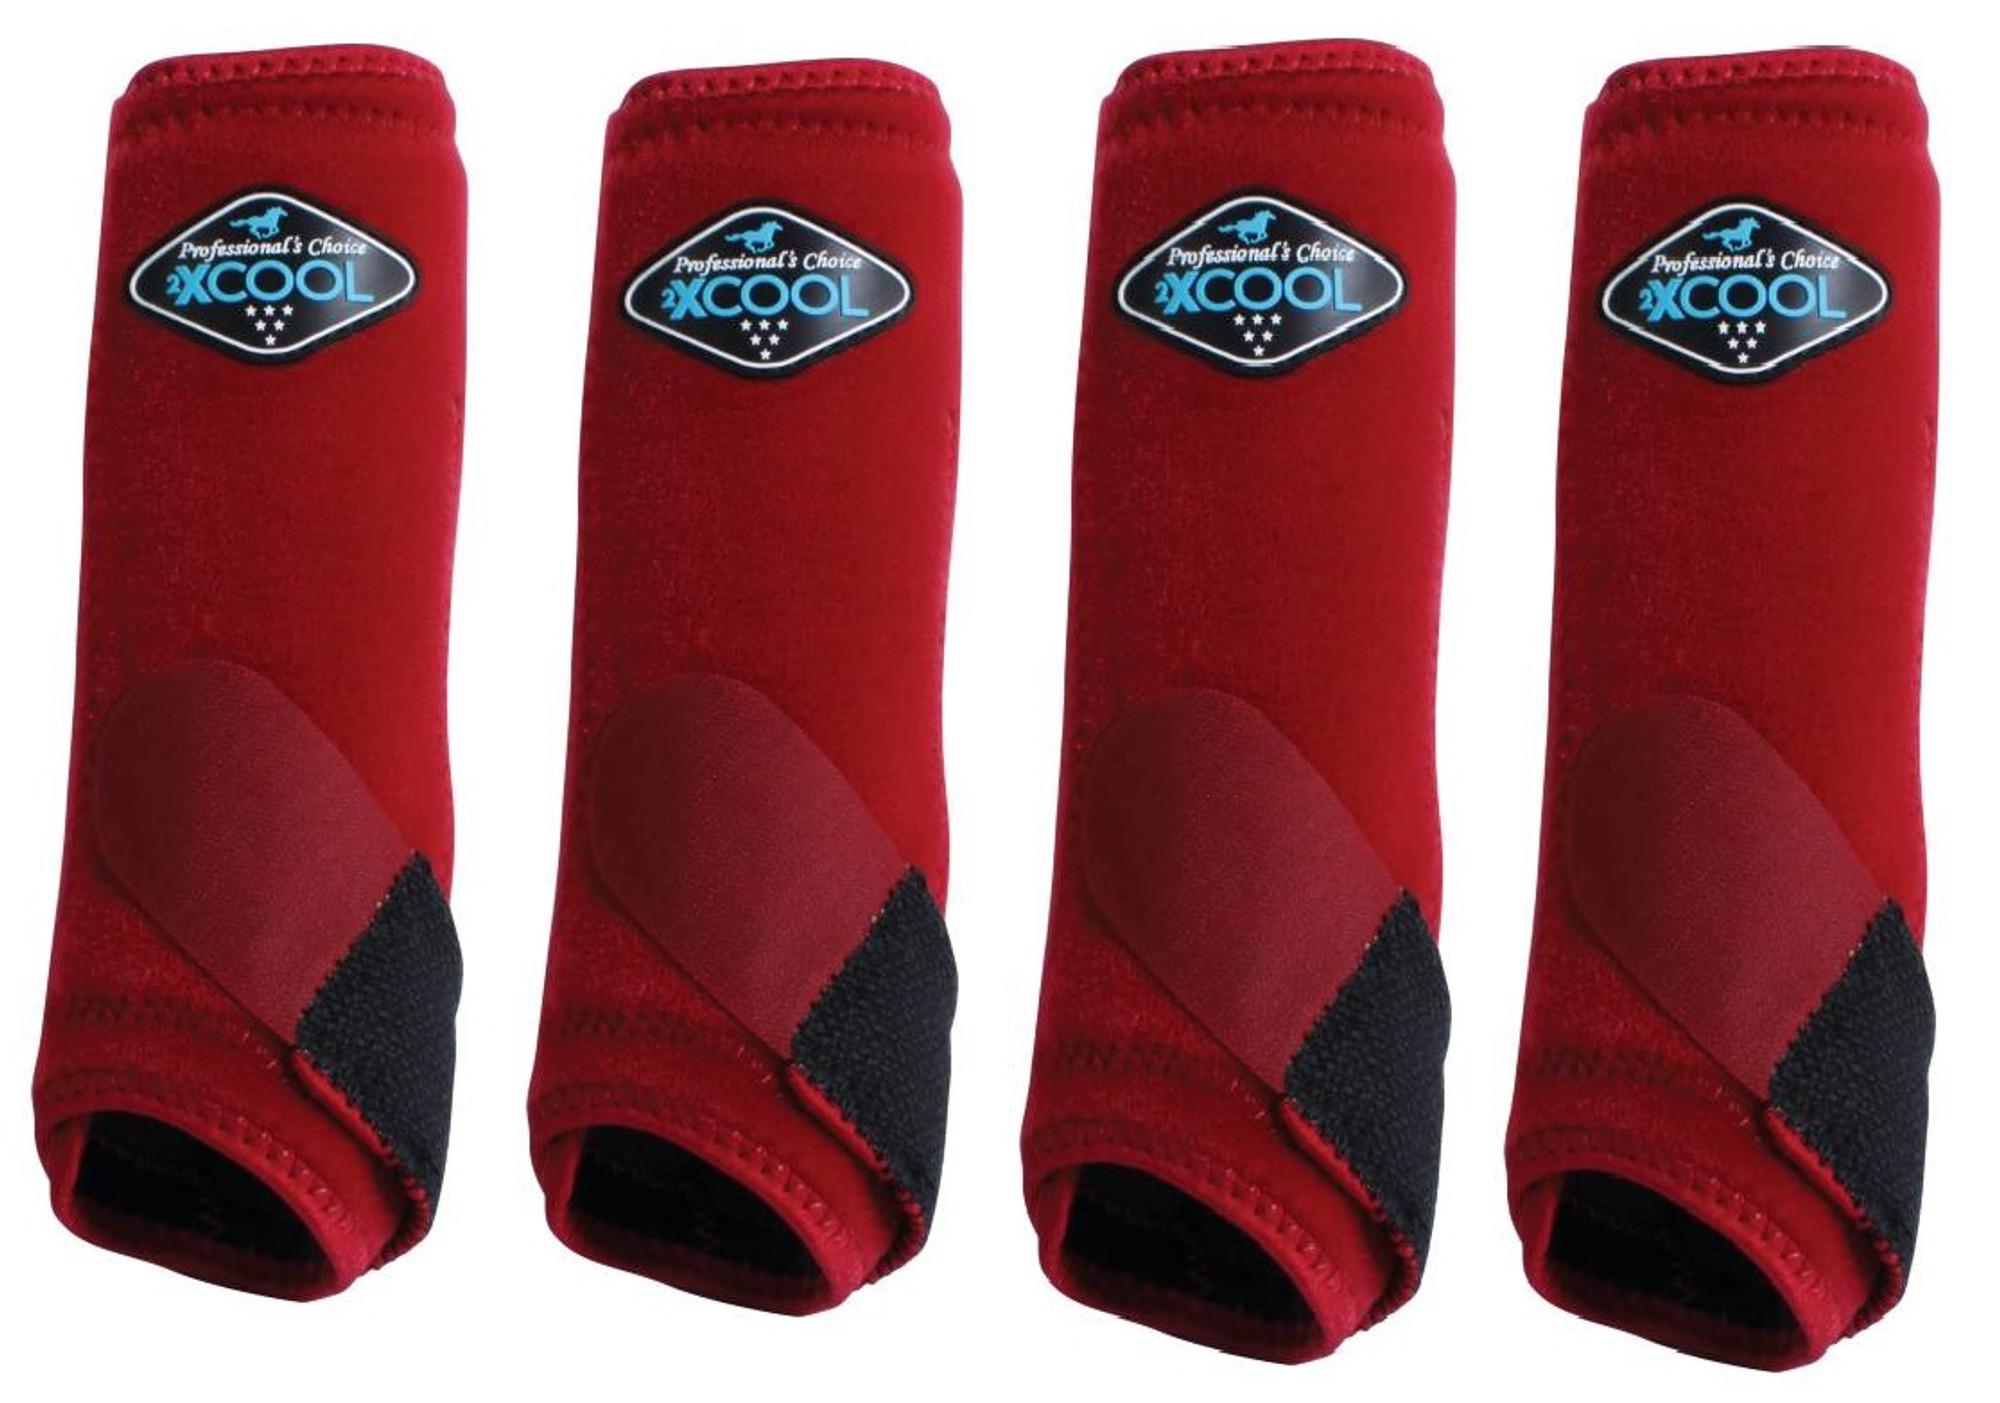 Details about  /Professionals Choice Brrr 2XCOOL Value 4 Pack Crimson Red  M Prof Pro SMB Boots